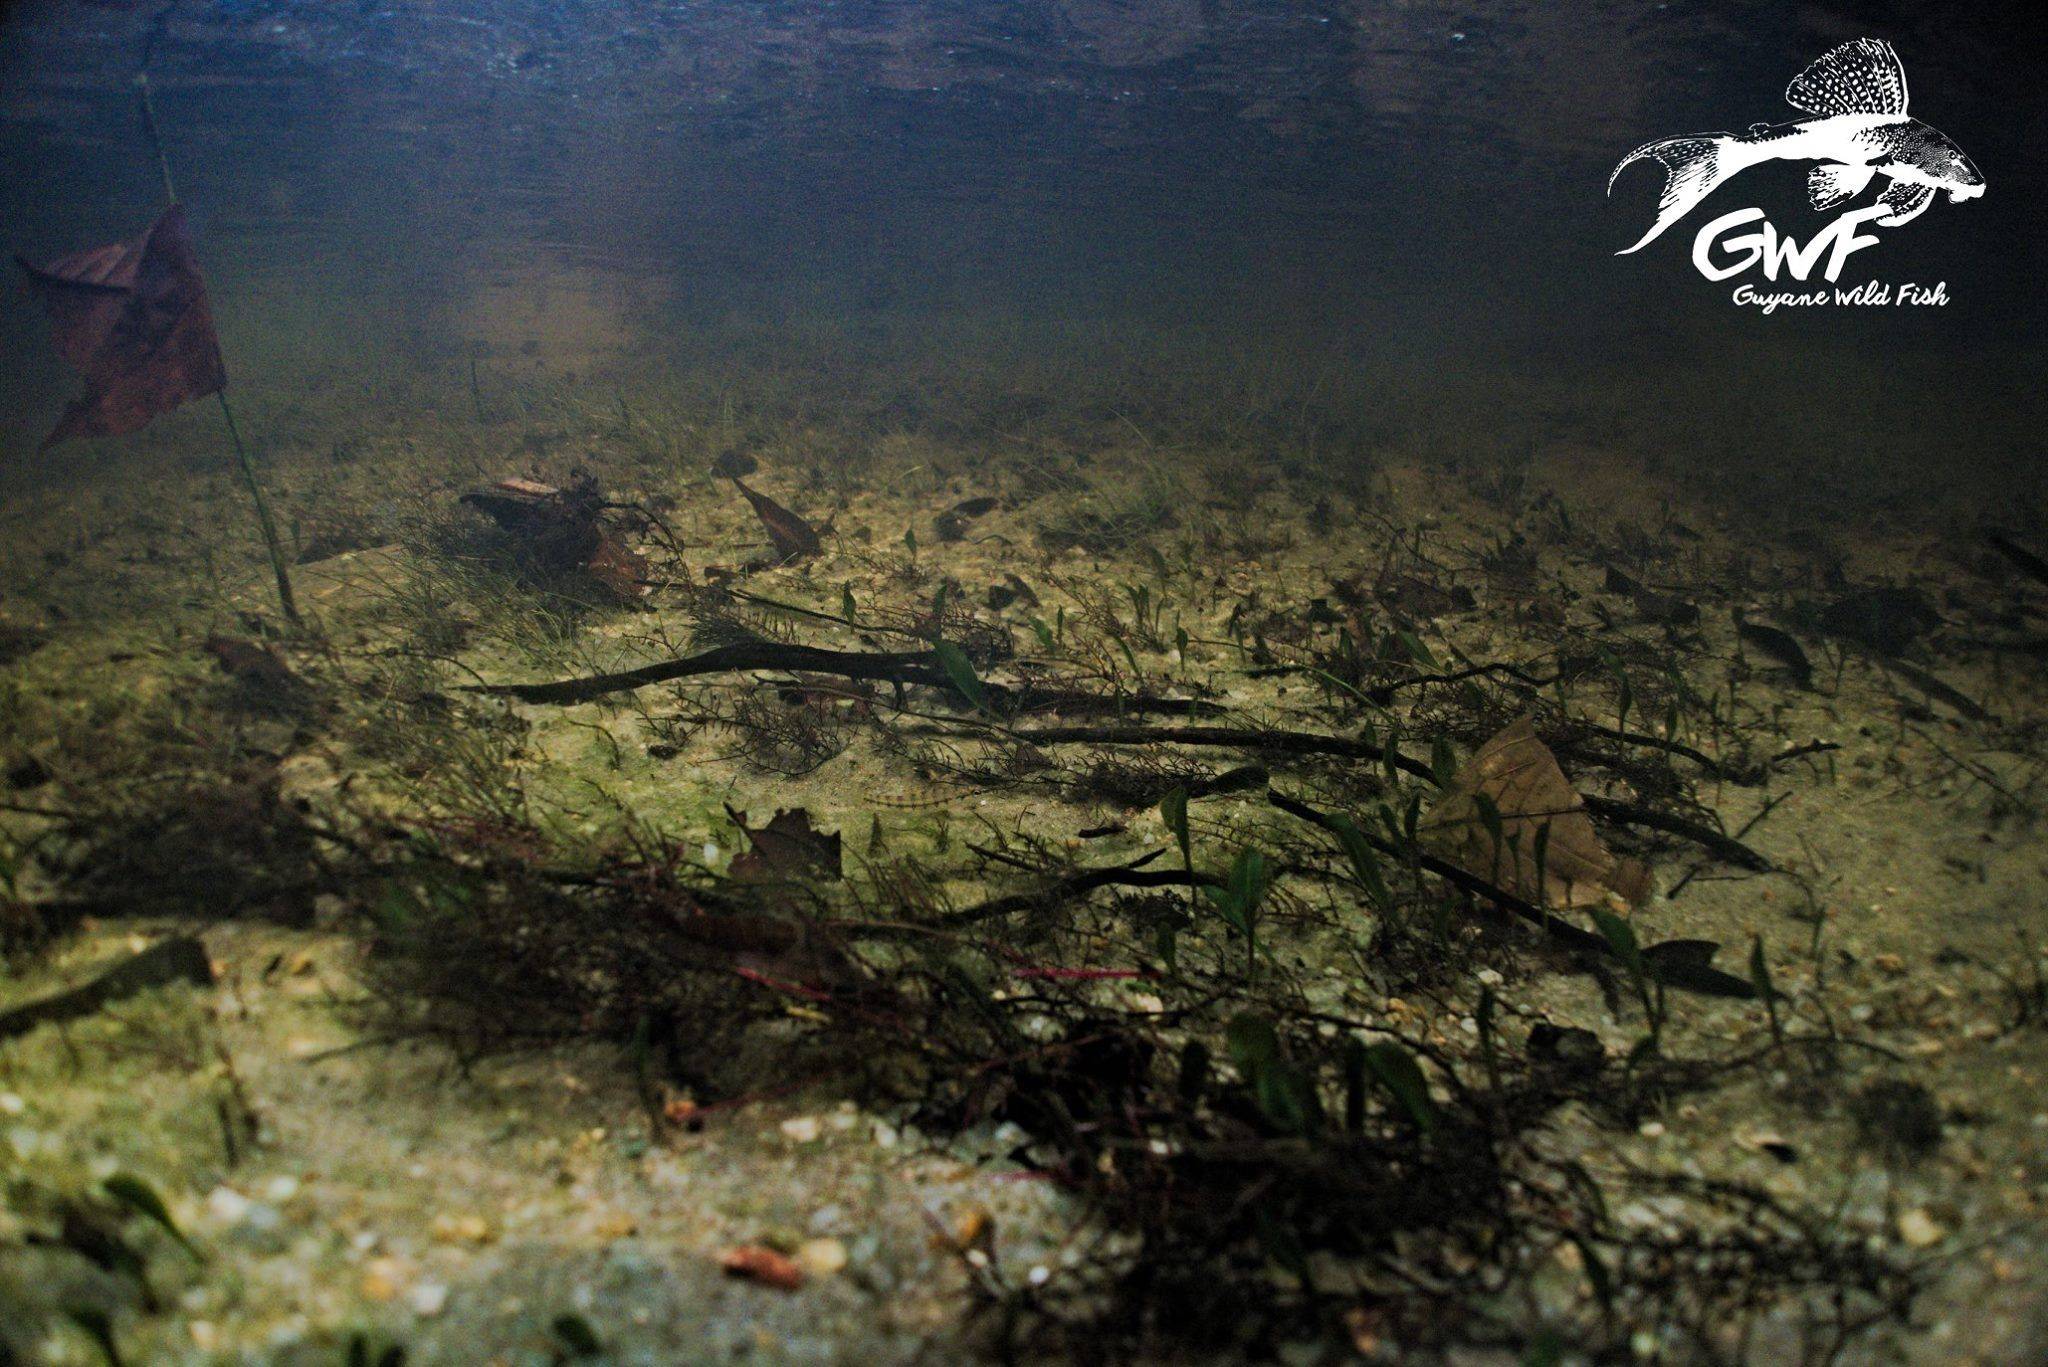 23210d20bae55f0917421e85793eefa8 Frais De Aquarium Amazonien Concept